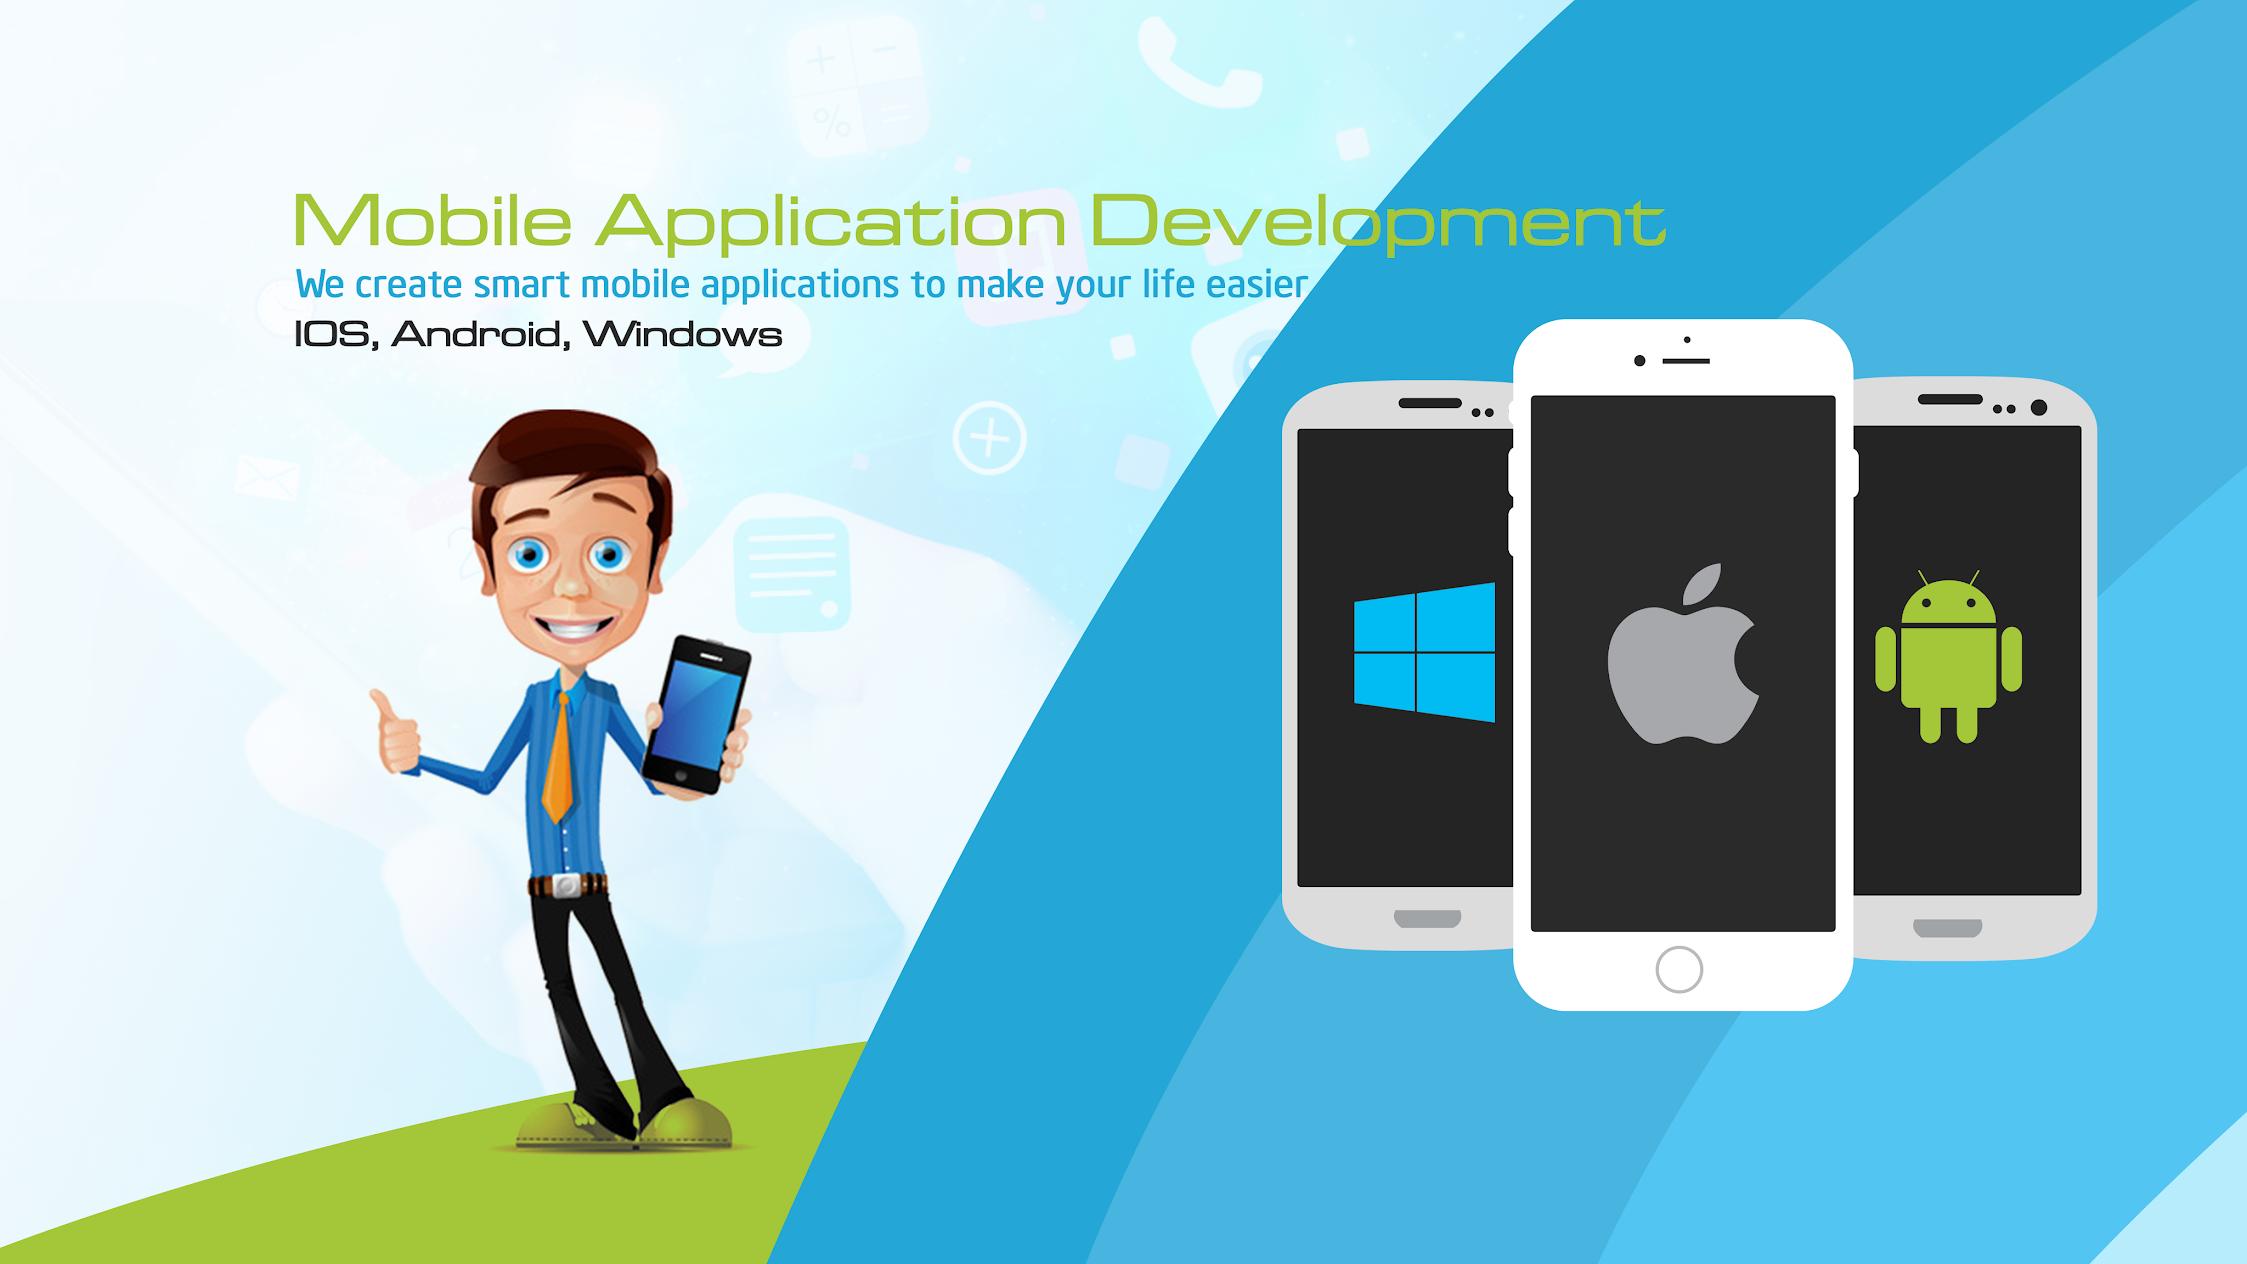 Creative Apps, Inc